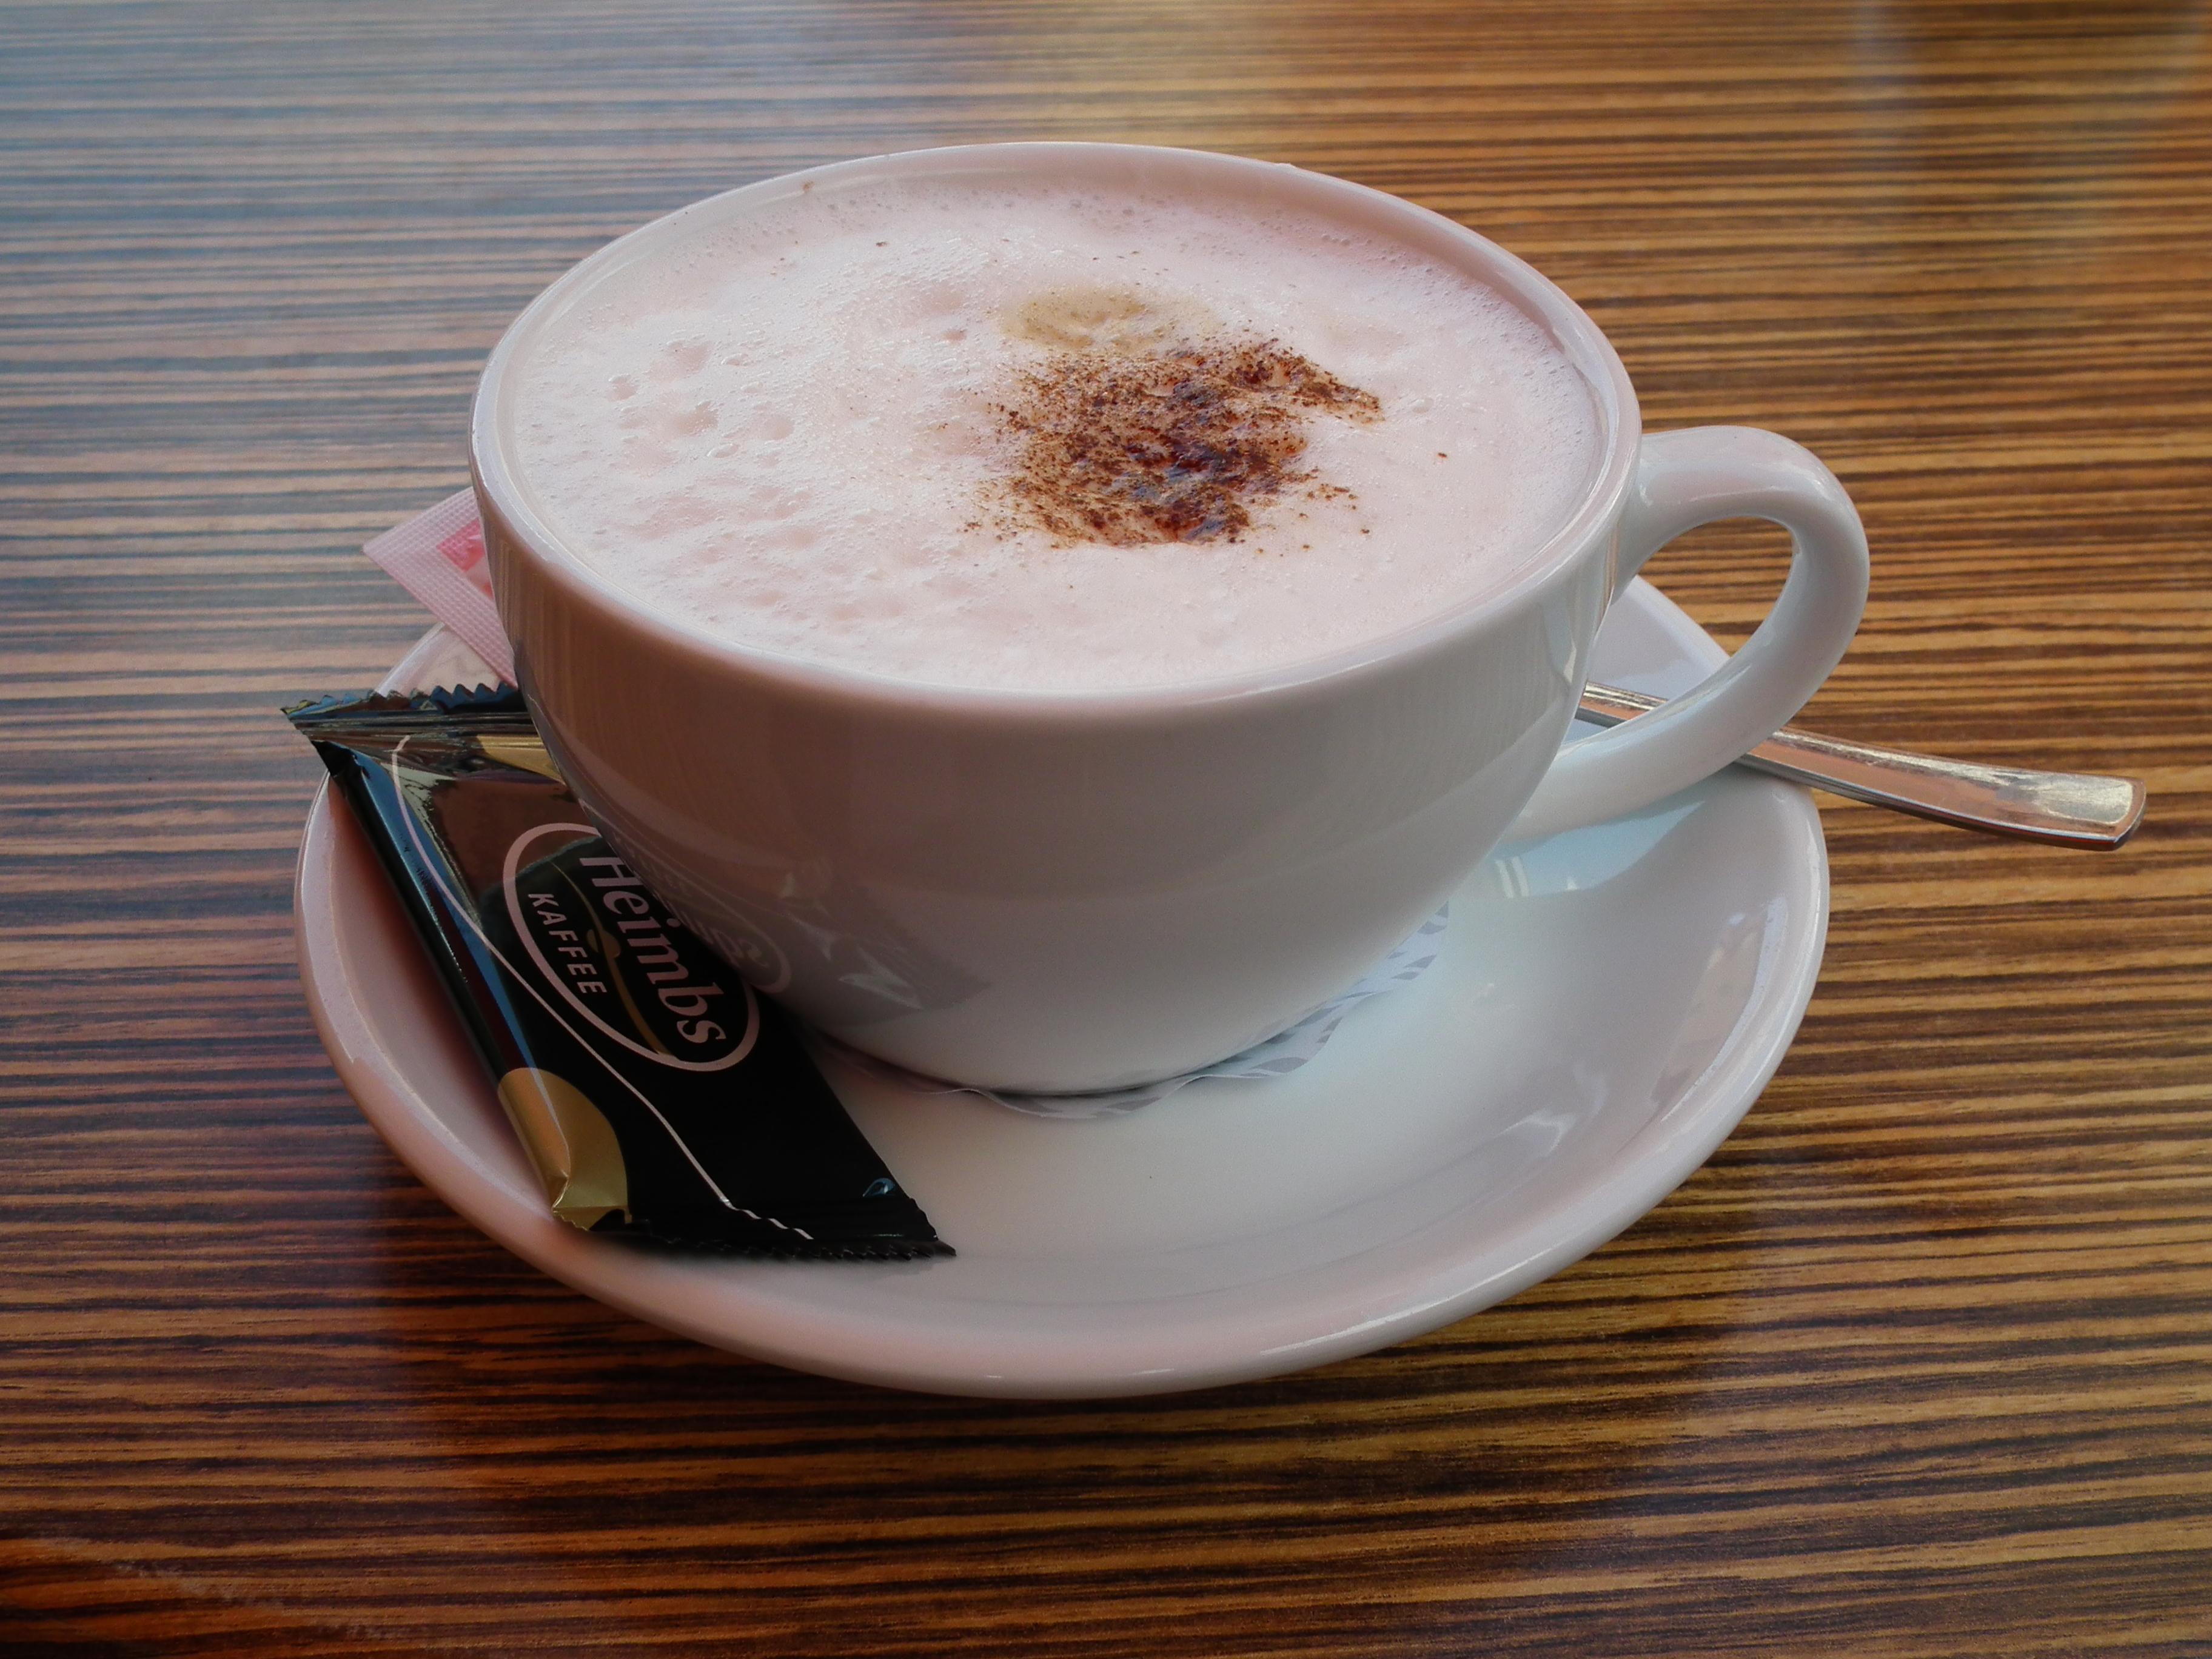 File:Cappuccino in weißer Tasse.JPG - Wikimedia Commons